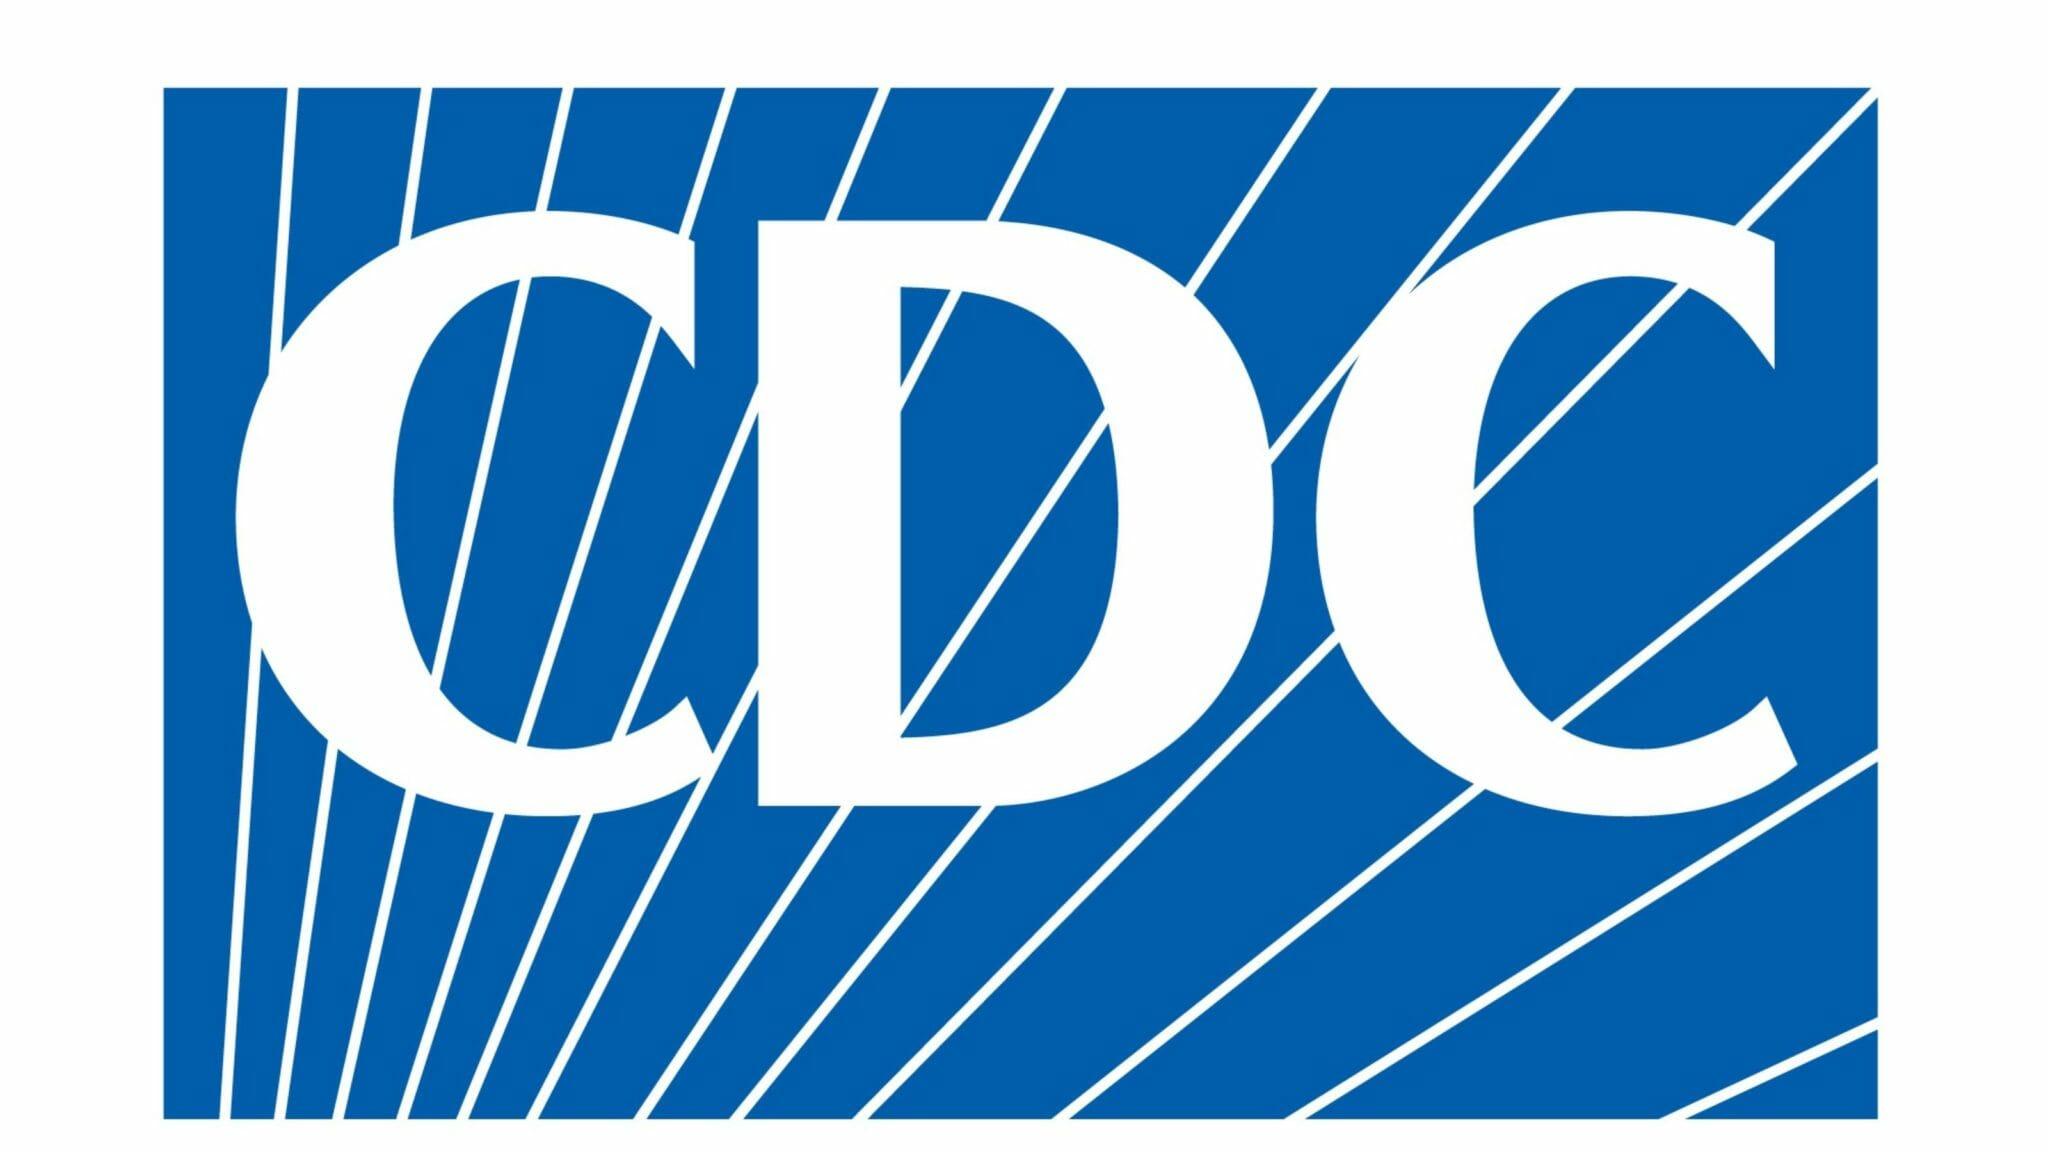 cdc-logo-2